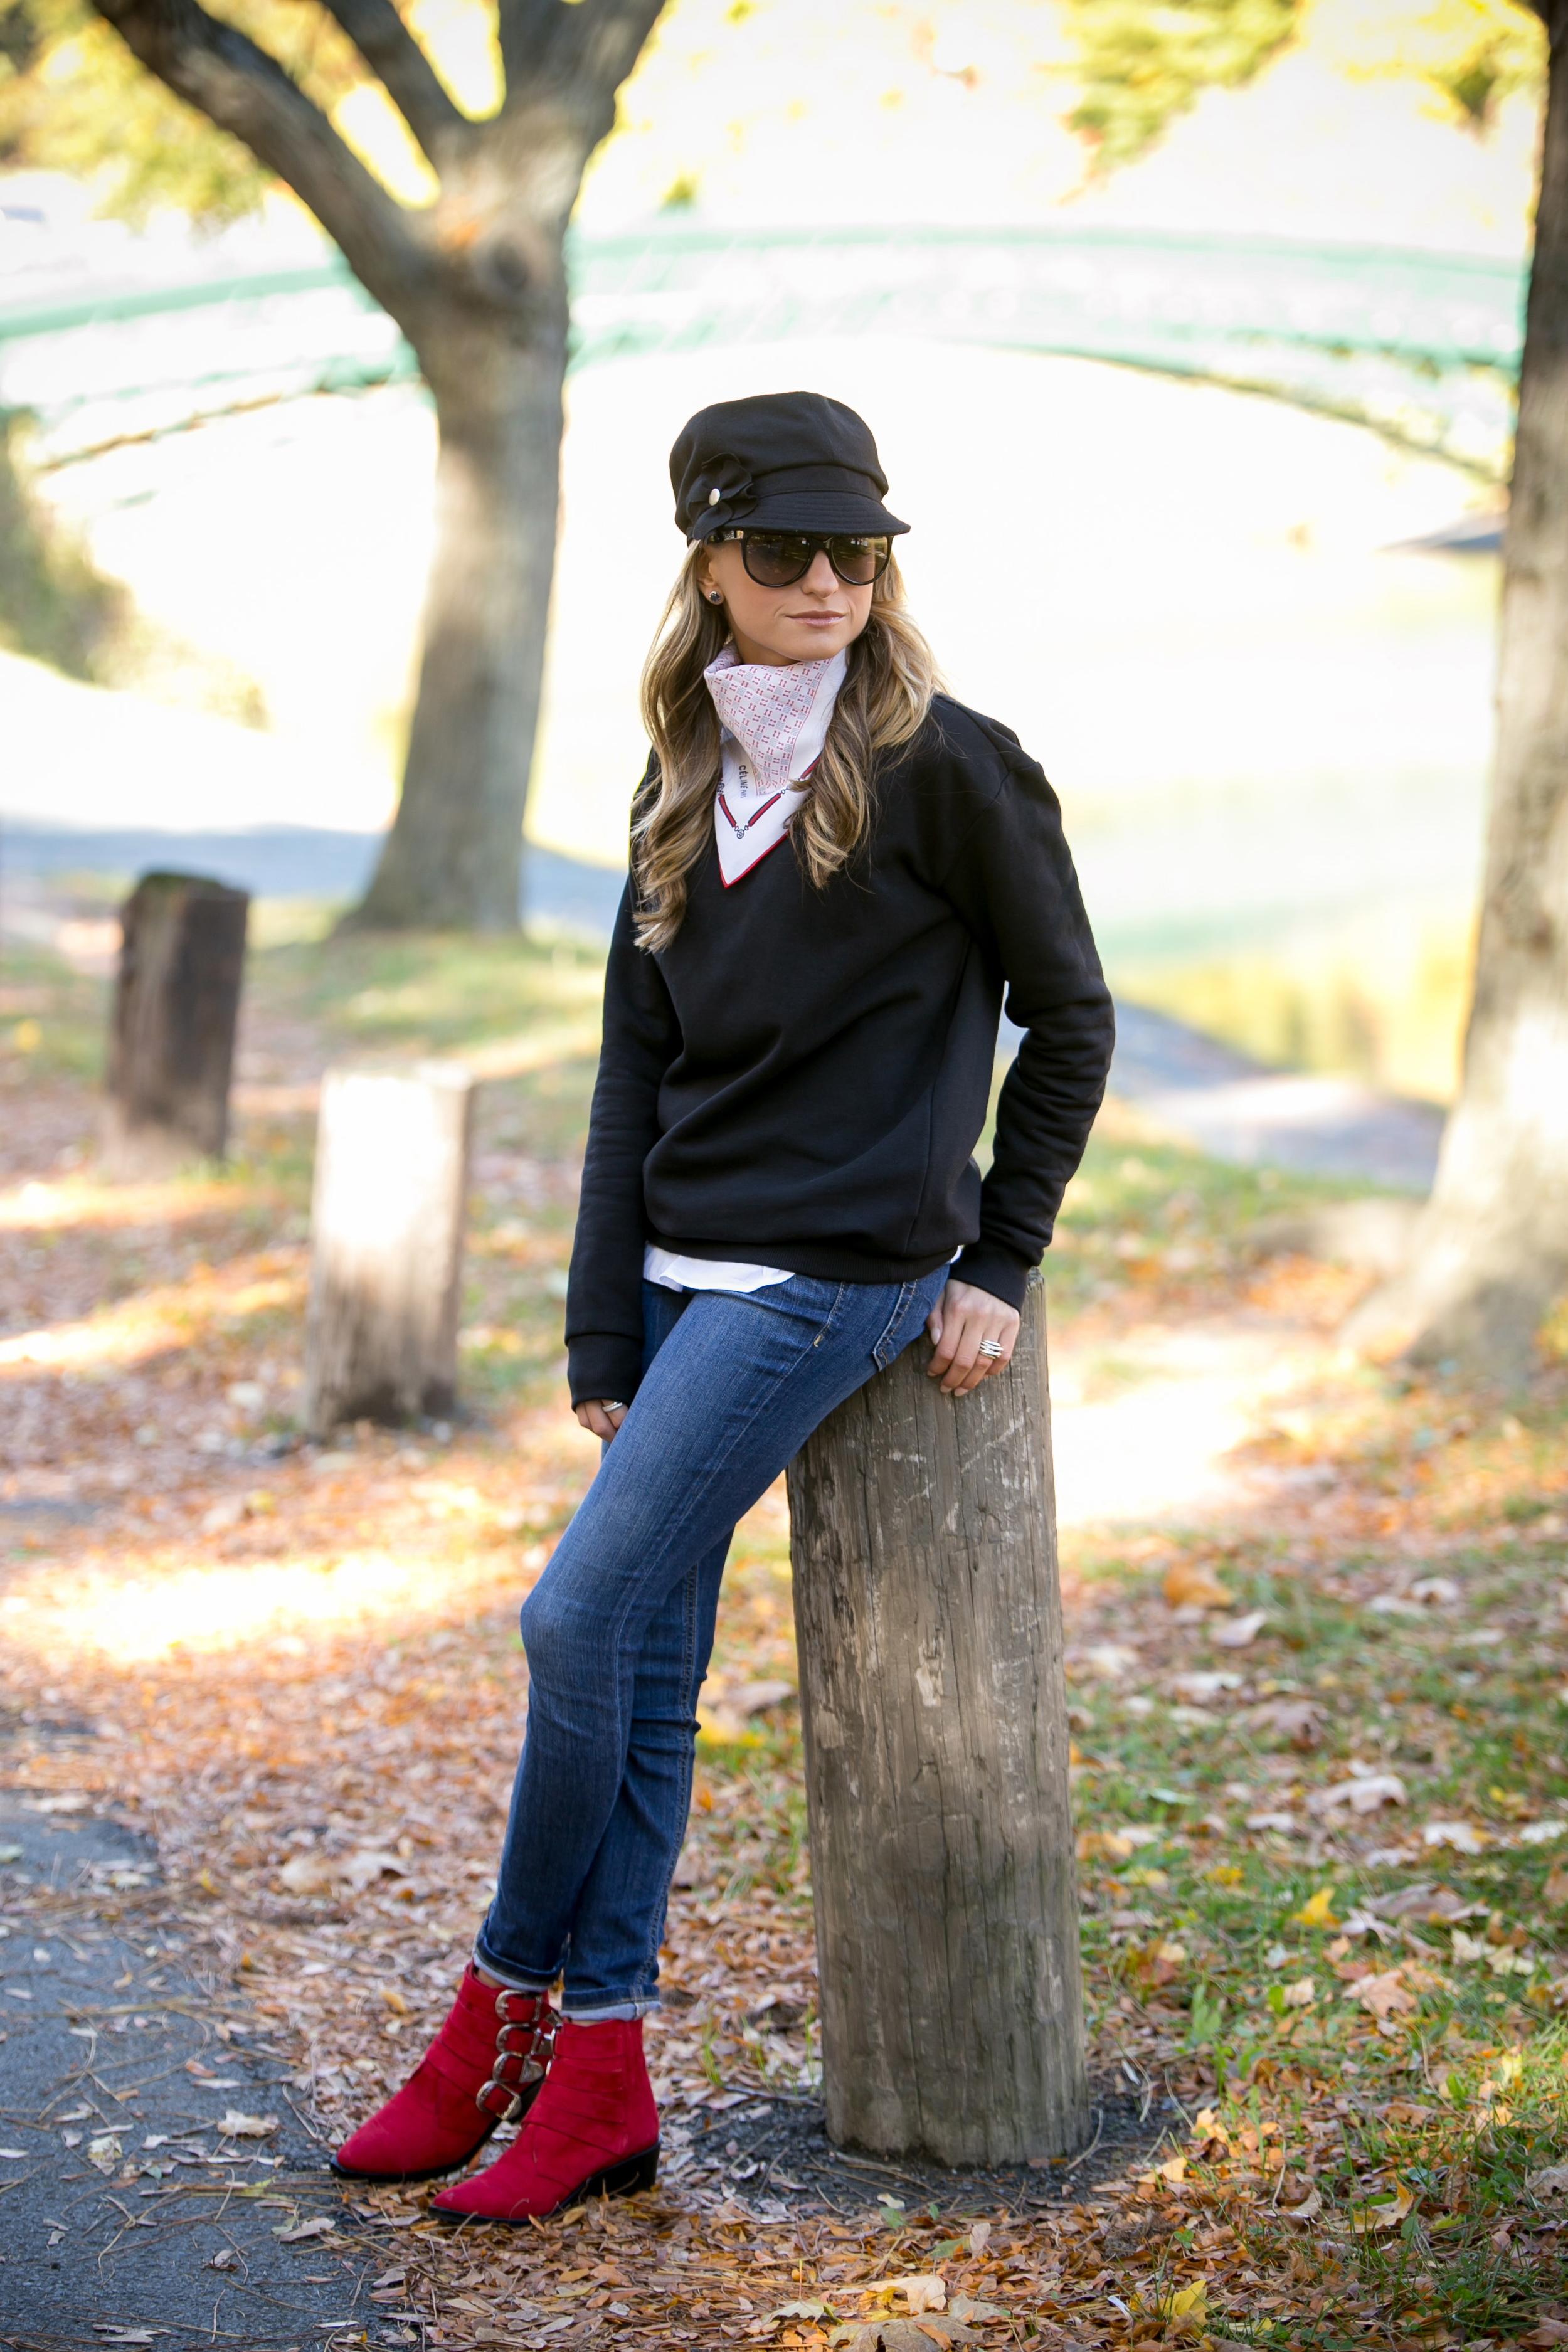 wearing H&M black sweatshirt, Joe's Jeans, Toga Pulla ankle boots, and vintage Celine